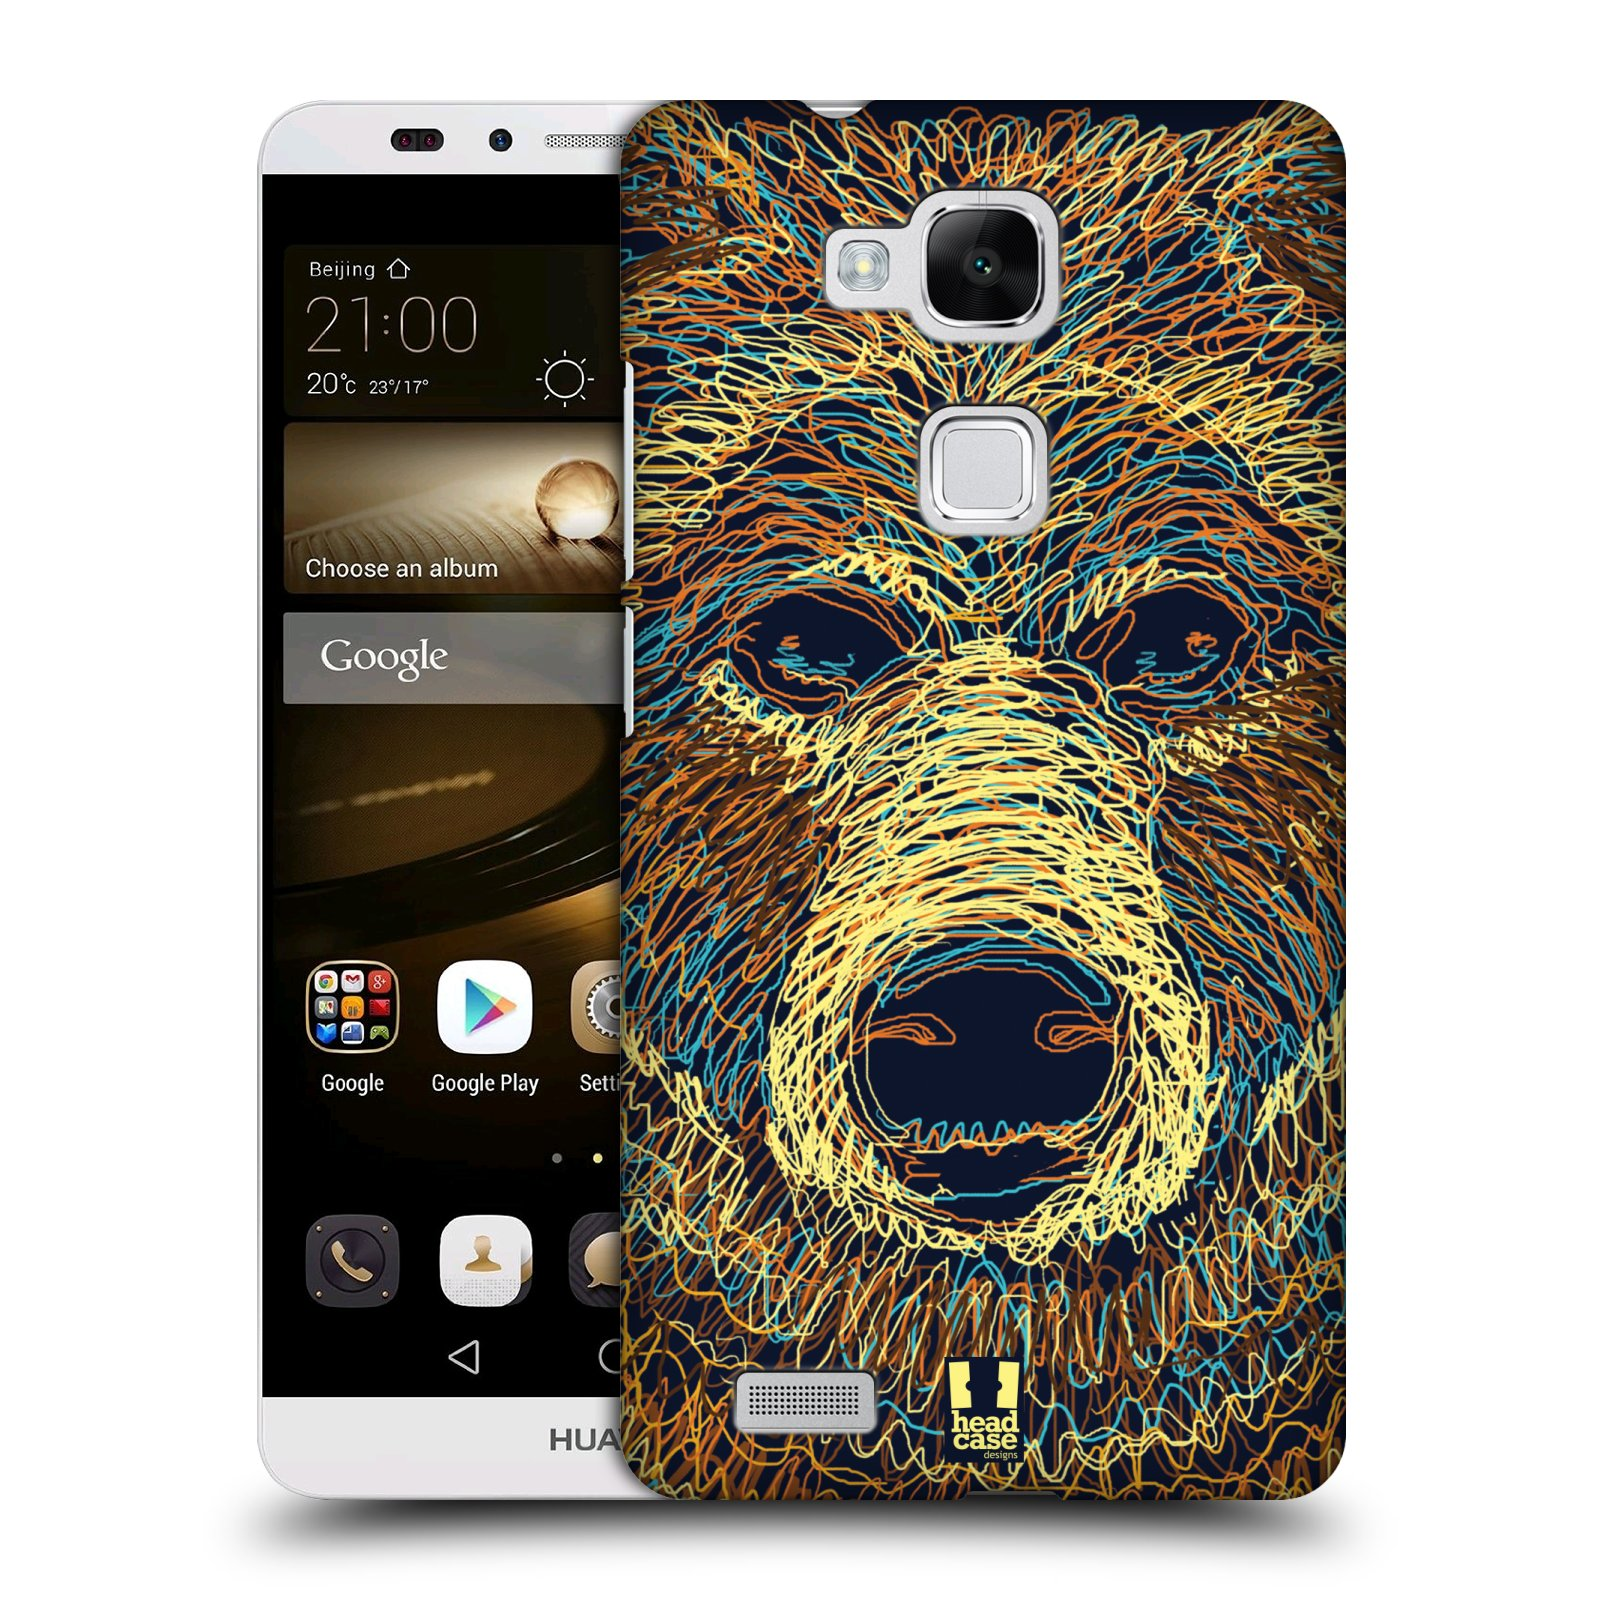 HEAD CASE plastový obal na mobil Huawei Mate 7 vzor zvíře čmáranice medvěd